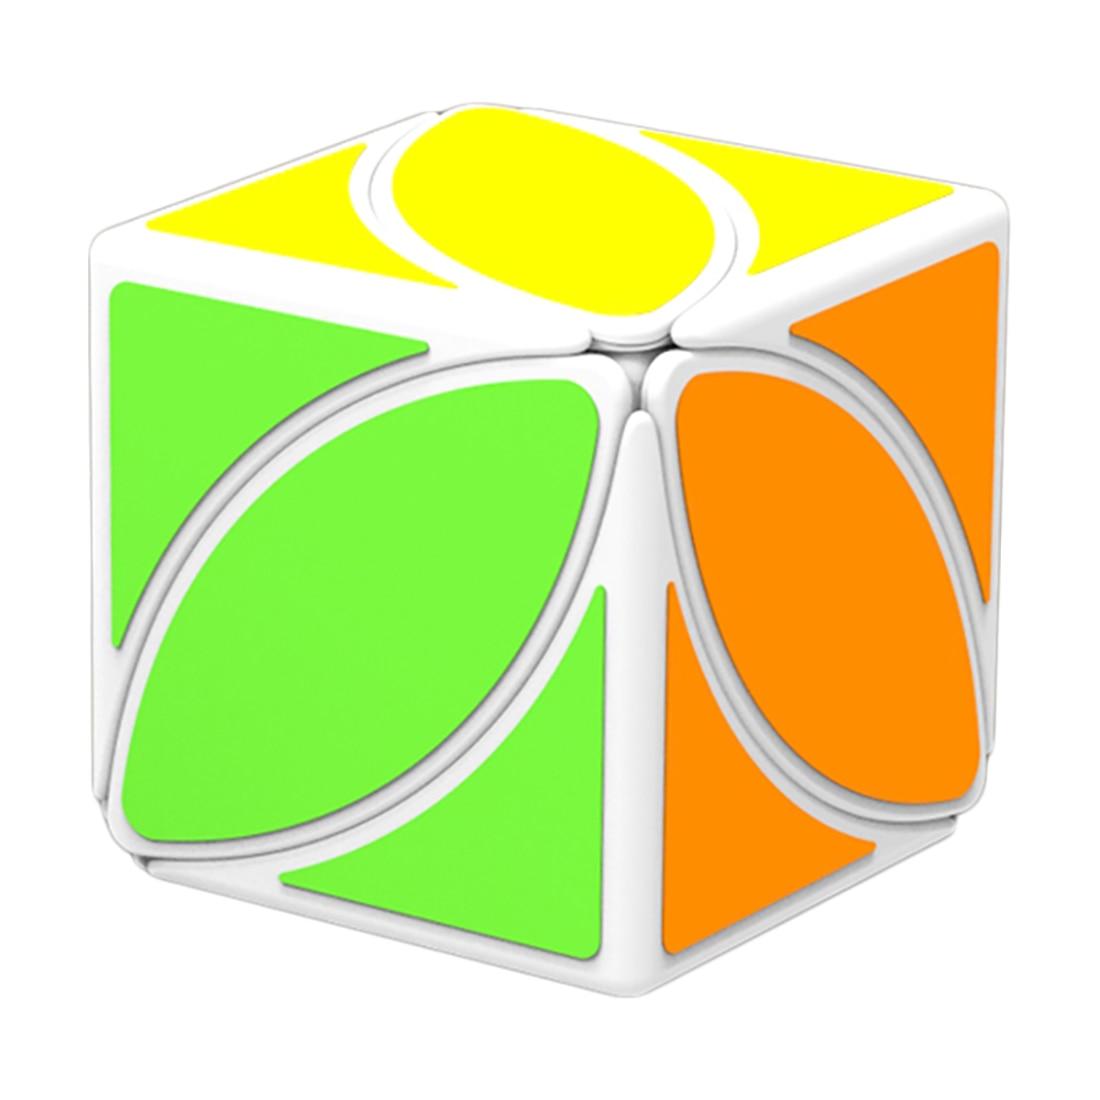 QiYi QY Mofangge Ivy font b Cube b font The First Twist font b Cube b